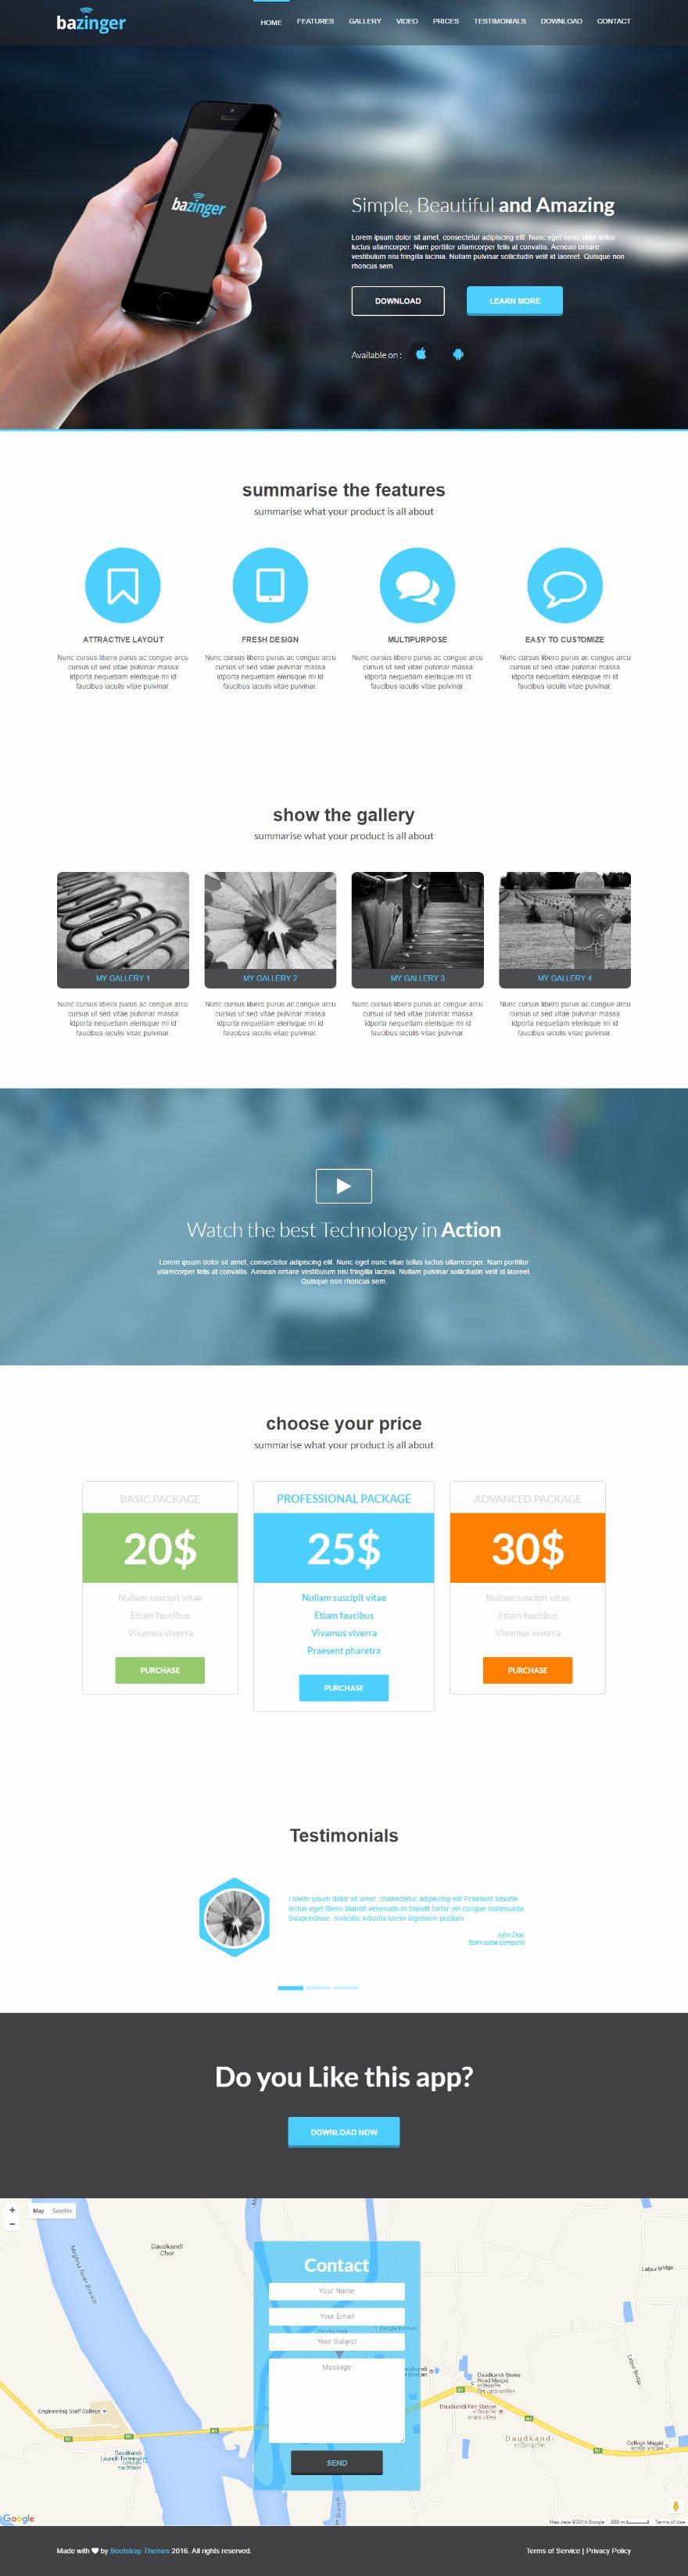 Github Bootstrapthemesco Bazinger Landing Page Template